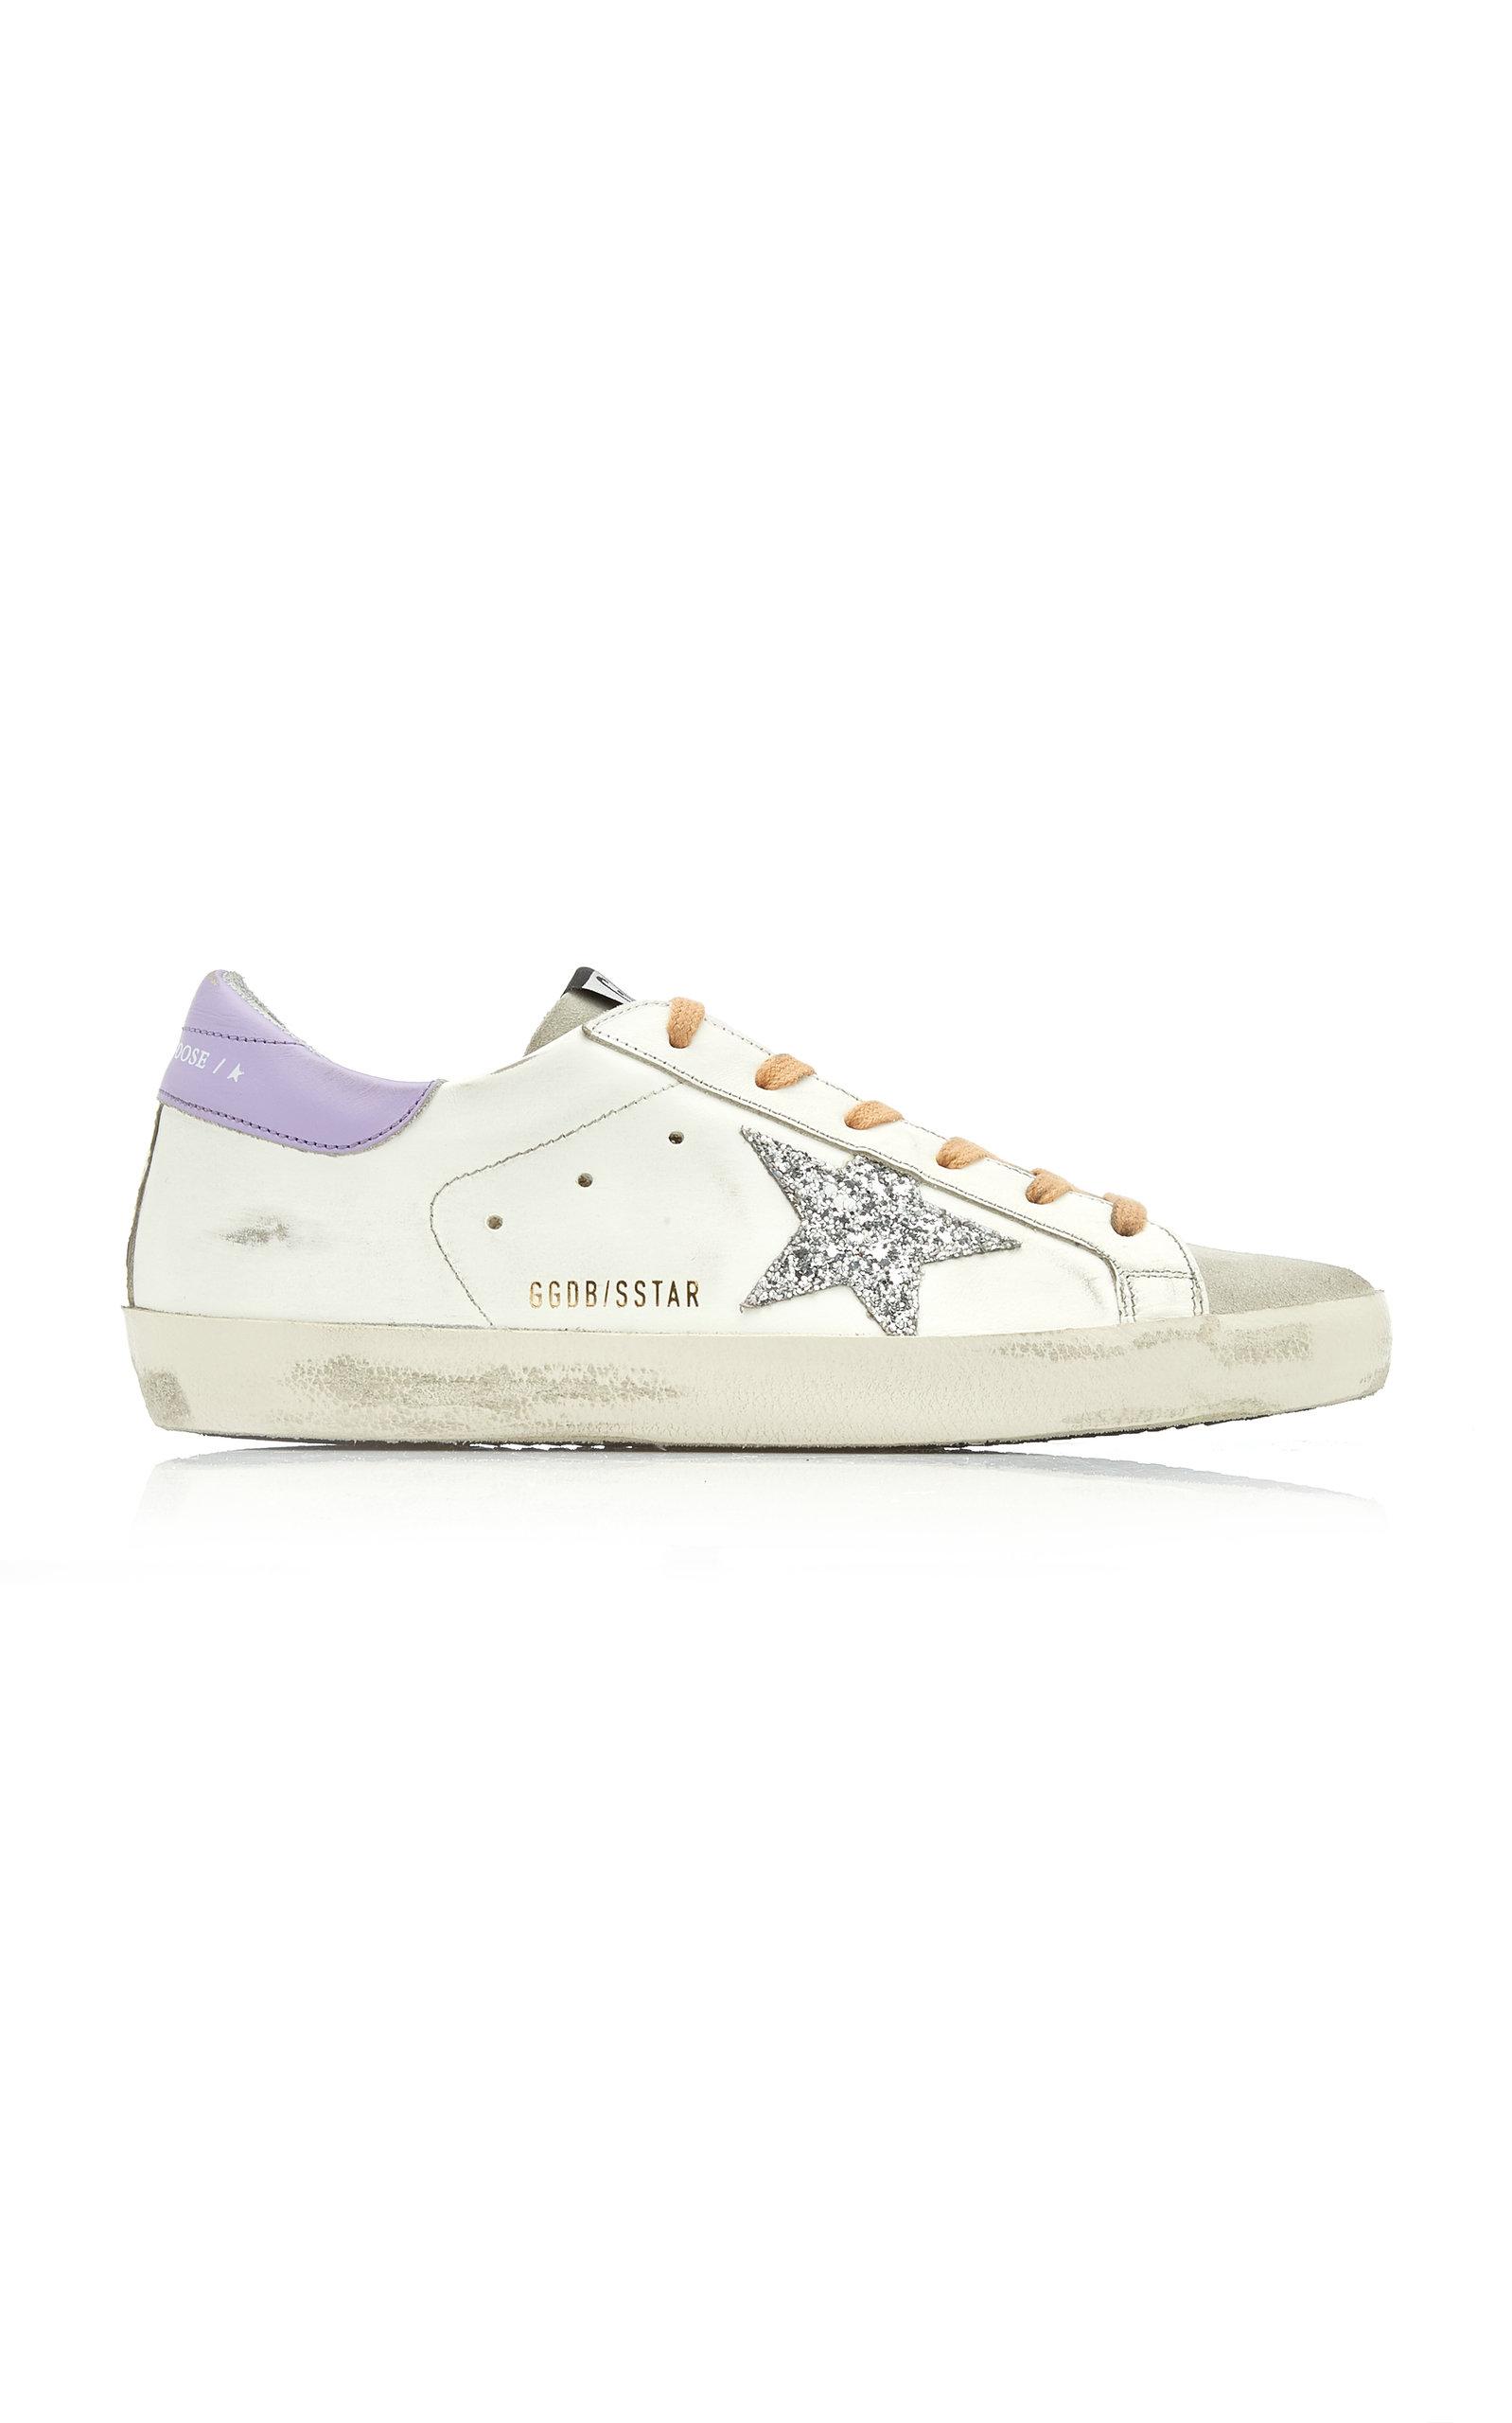 Golden Goose - Women's Superstar Glitter-Embellished Leather Sneakers  - Multi - Moda Operandi